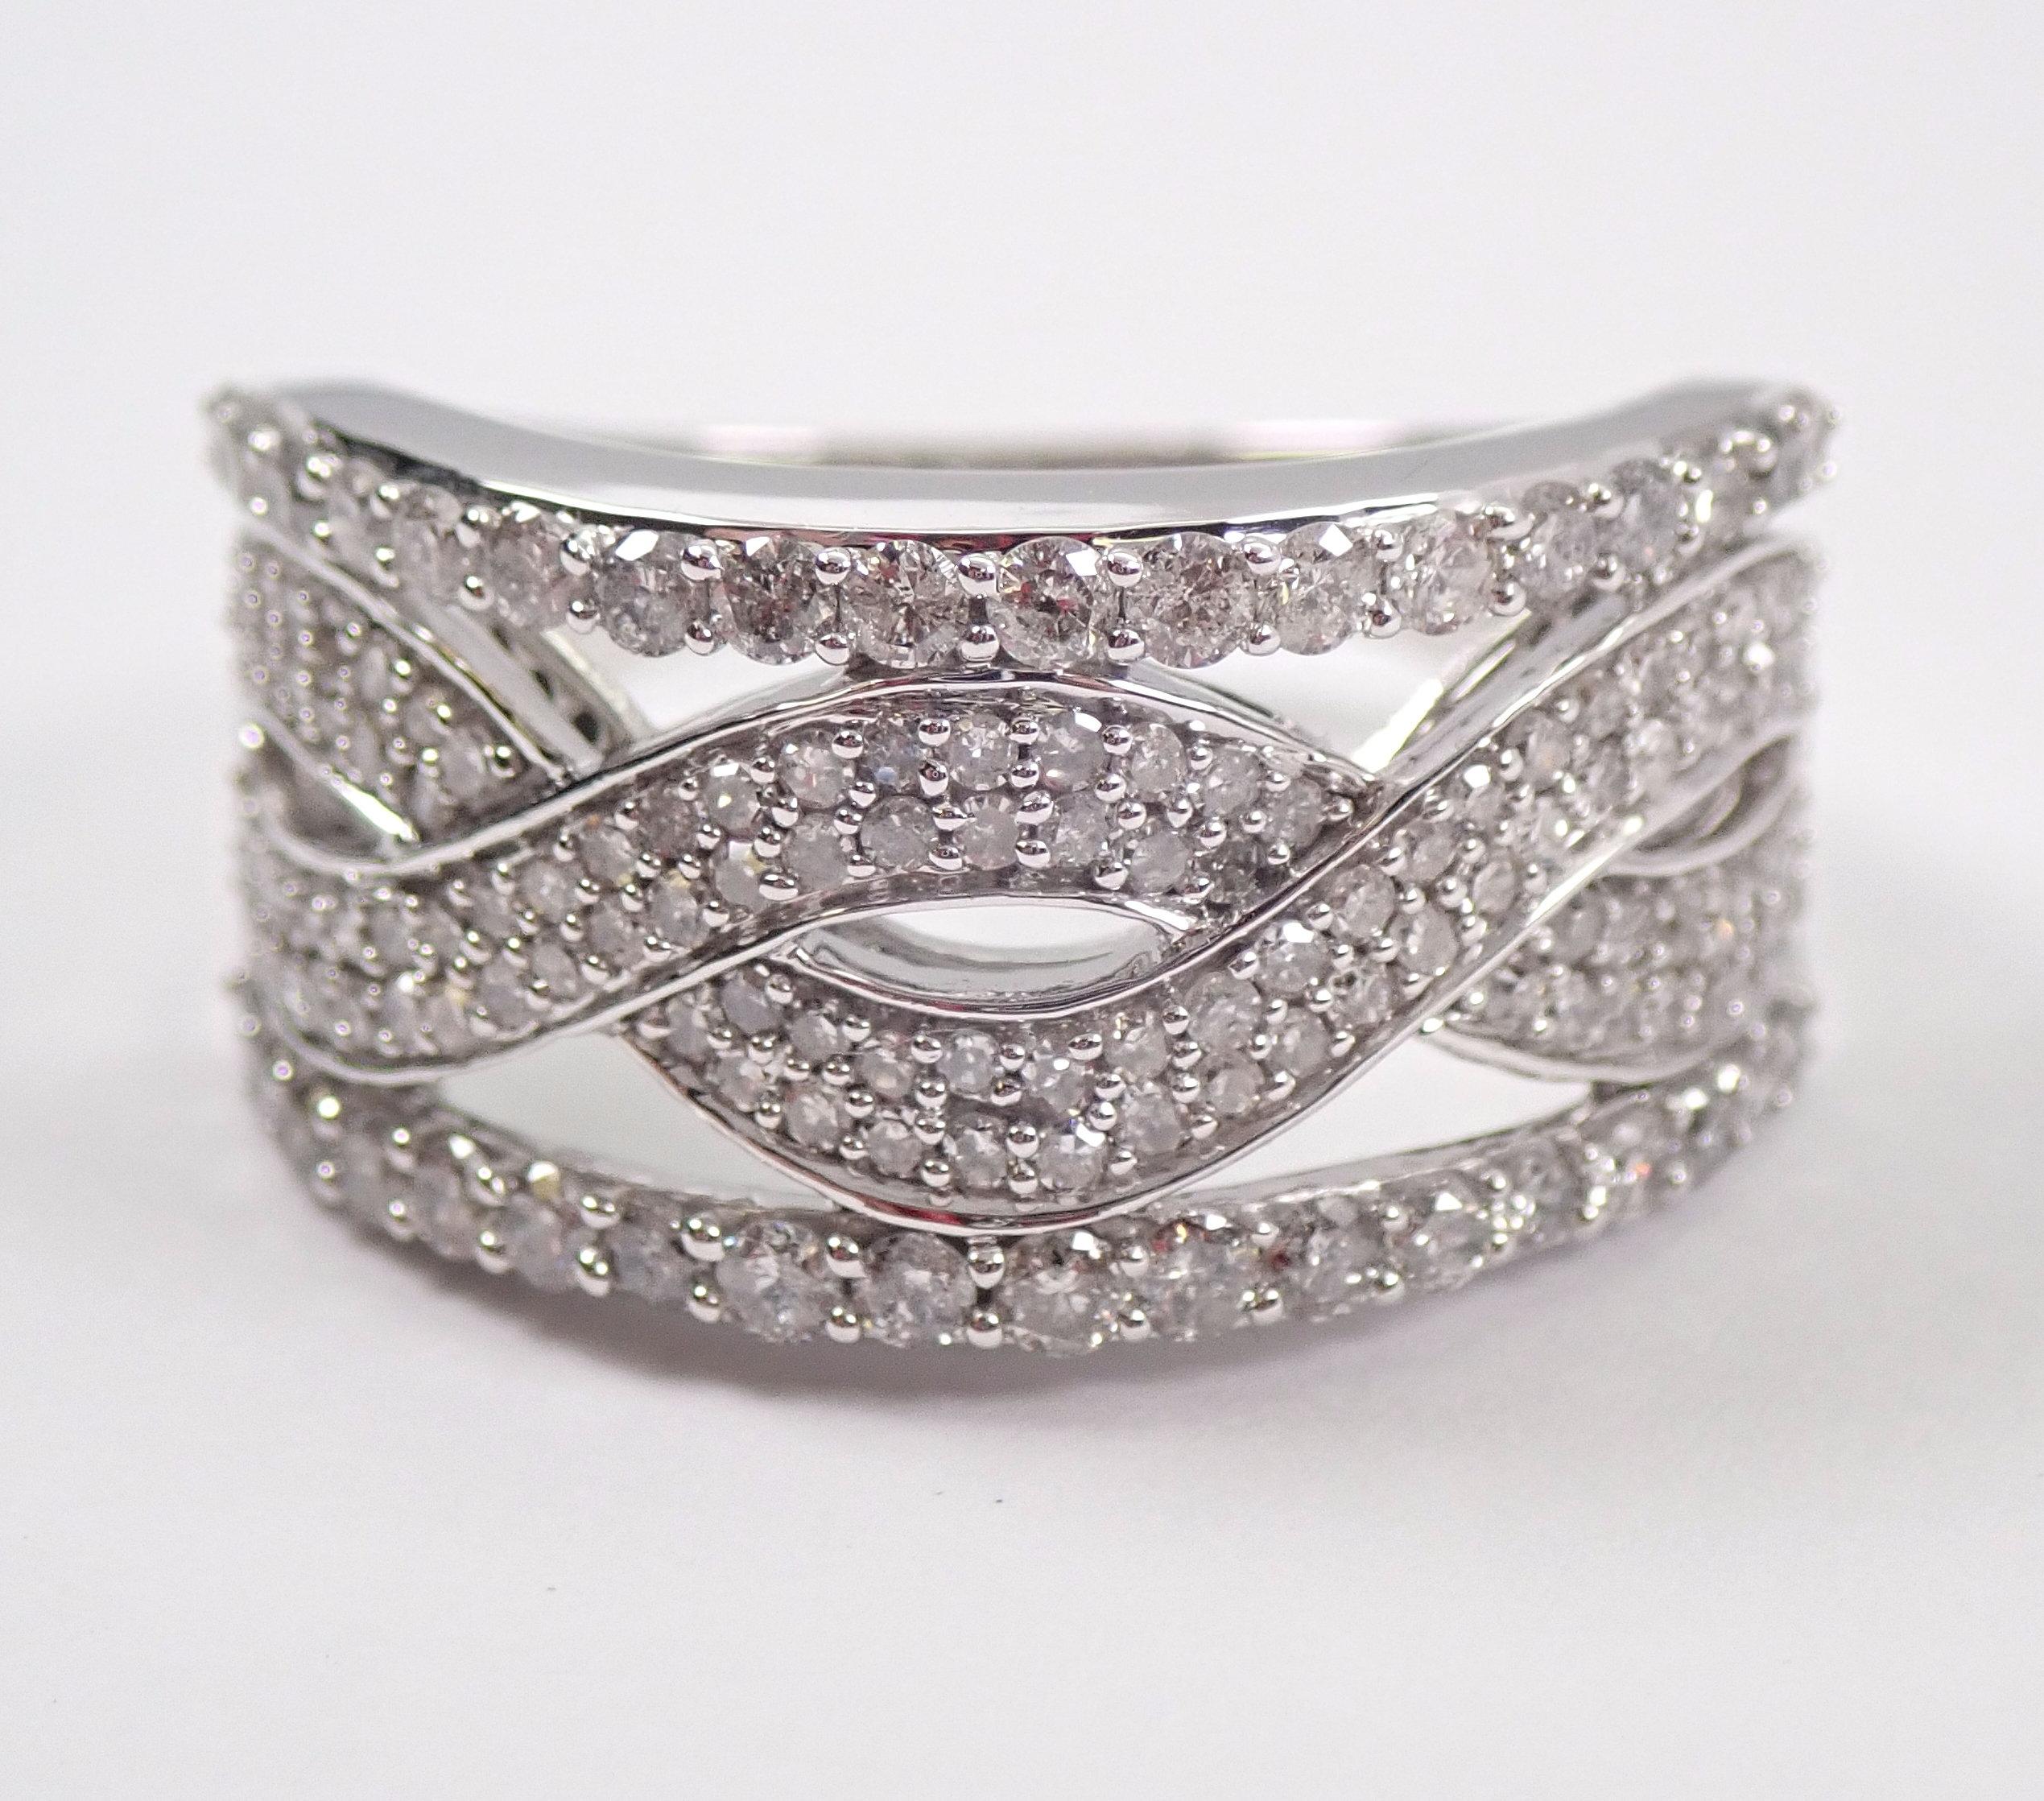 White Gold Diamond Anniversary Ring Multi Row Stackable Regarding Most Recent Diamond Multi Row Anniversary Ring In White Gold (View 14 of 25)